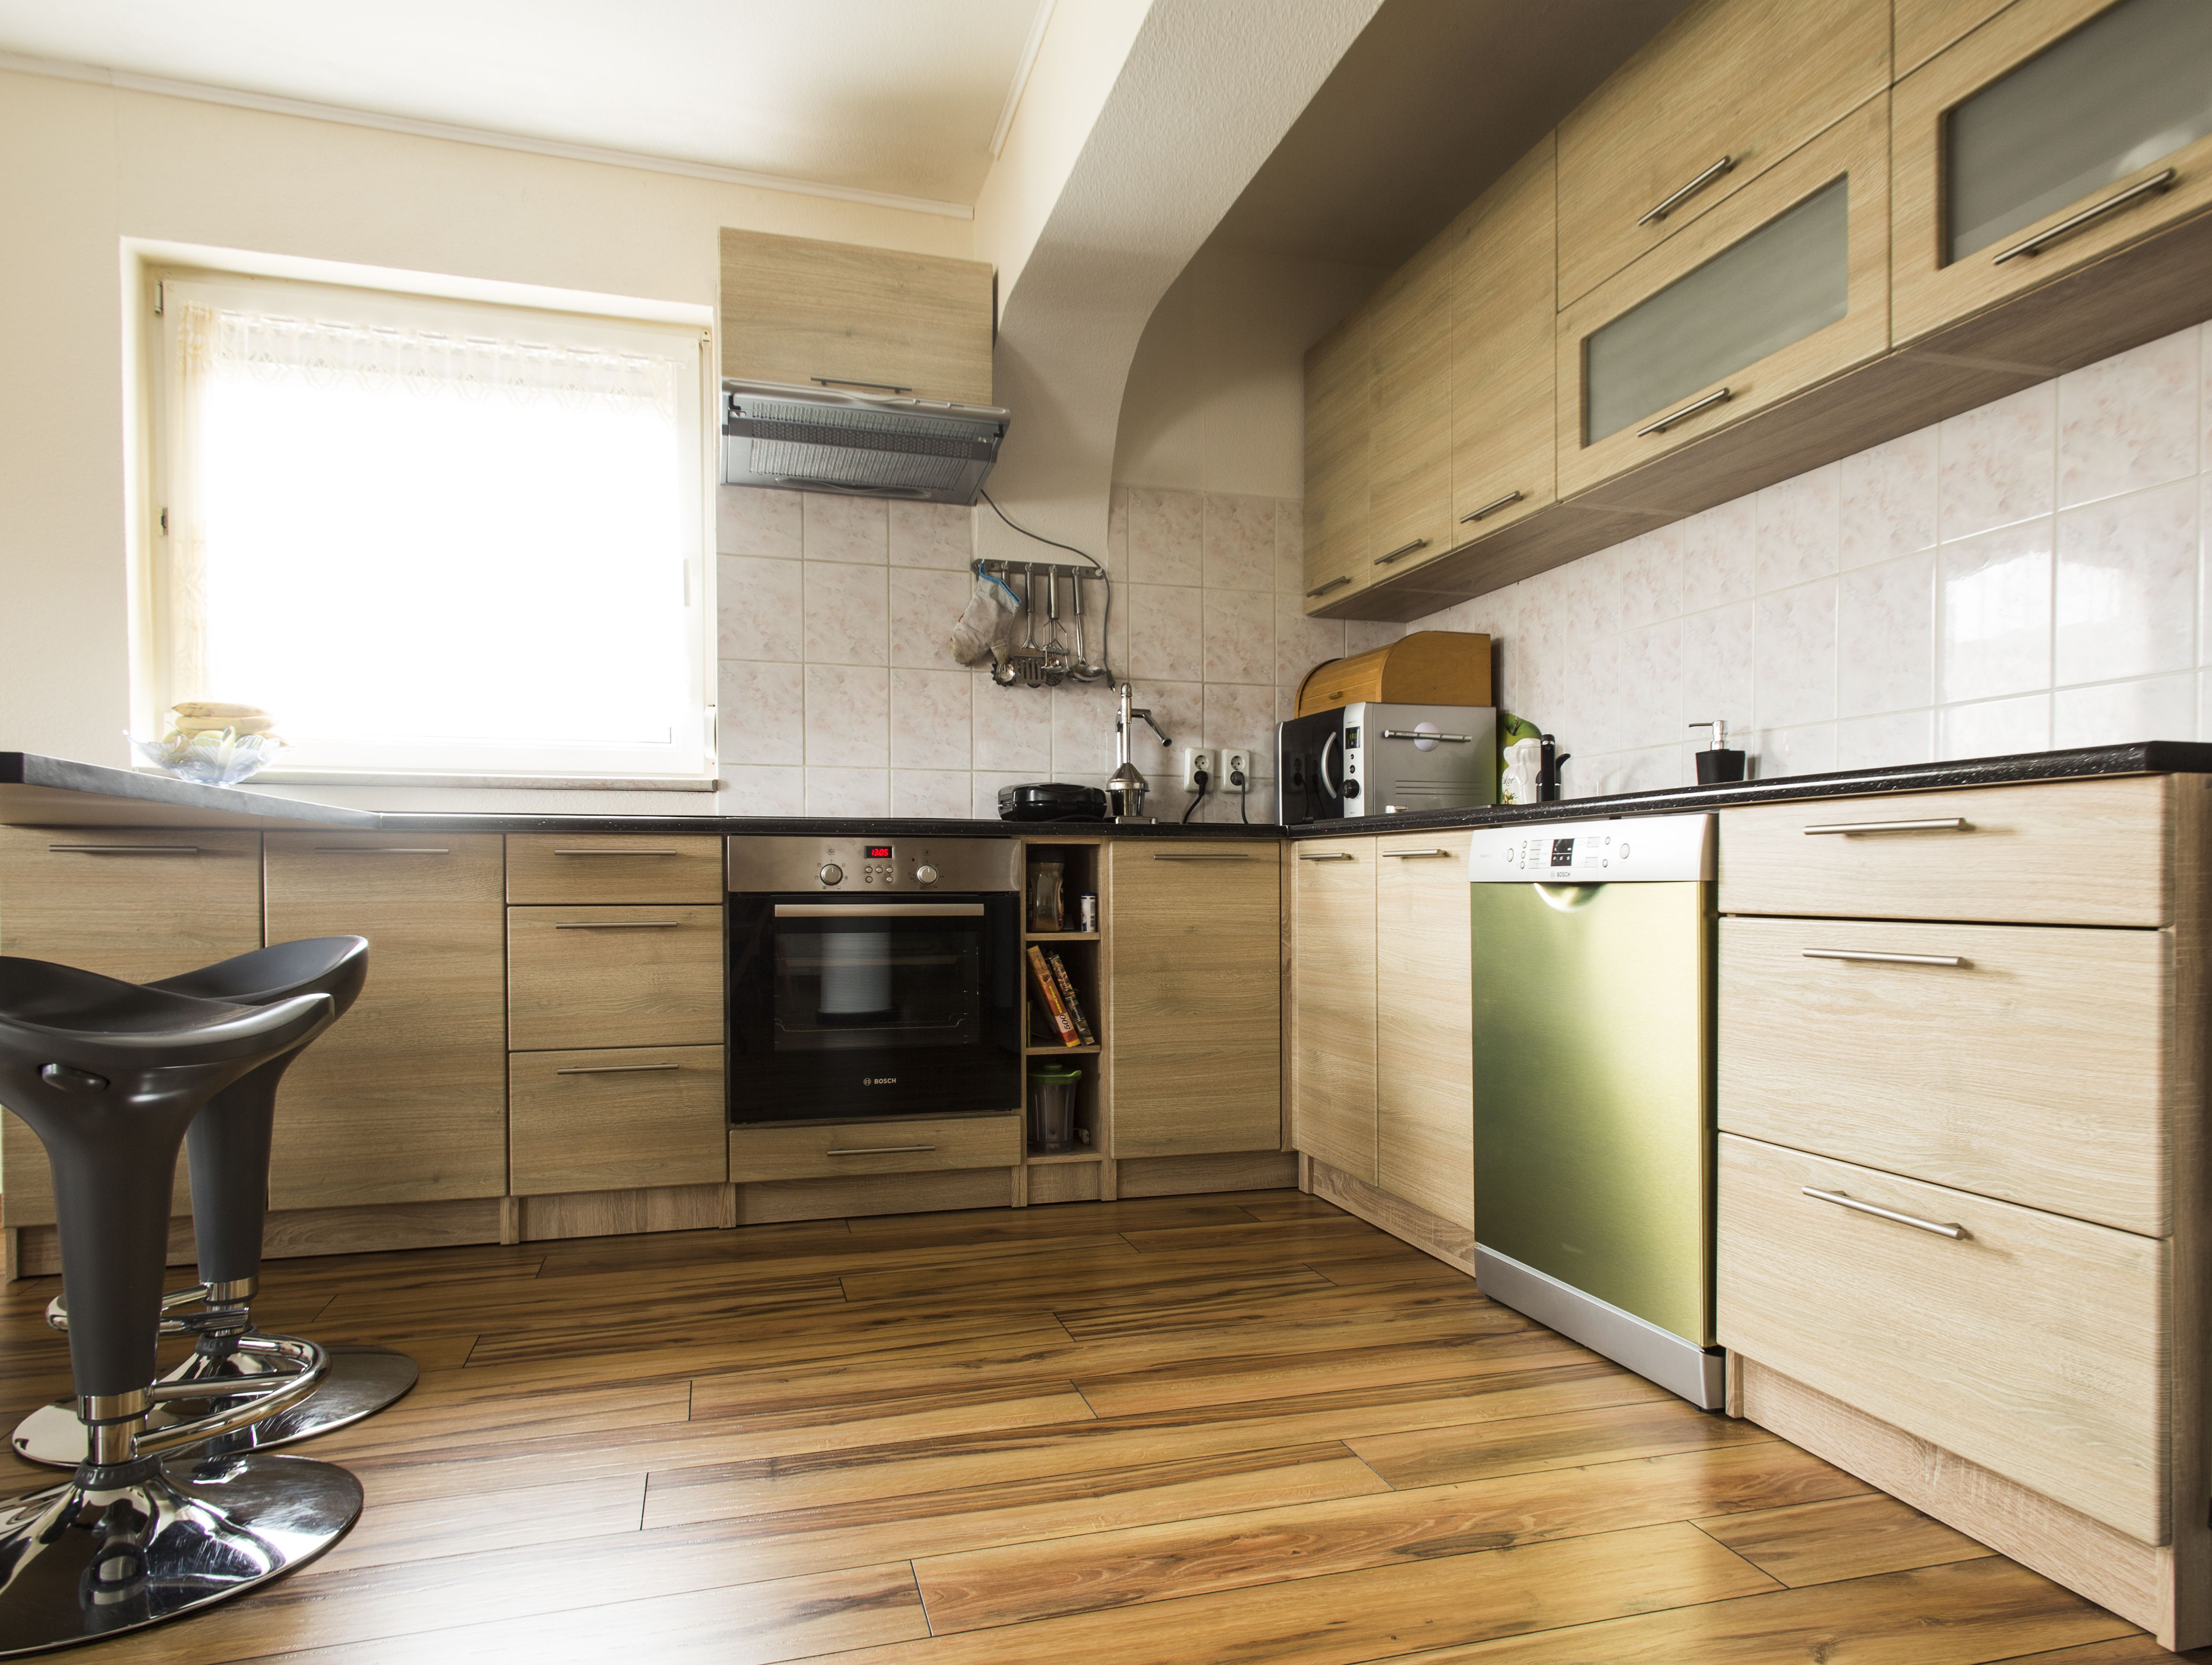 28 best Lakberendezés images on Pinterest   Kitchen ideas, Kitchens ...